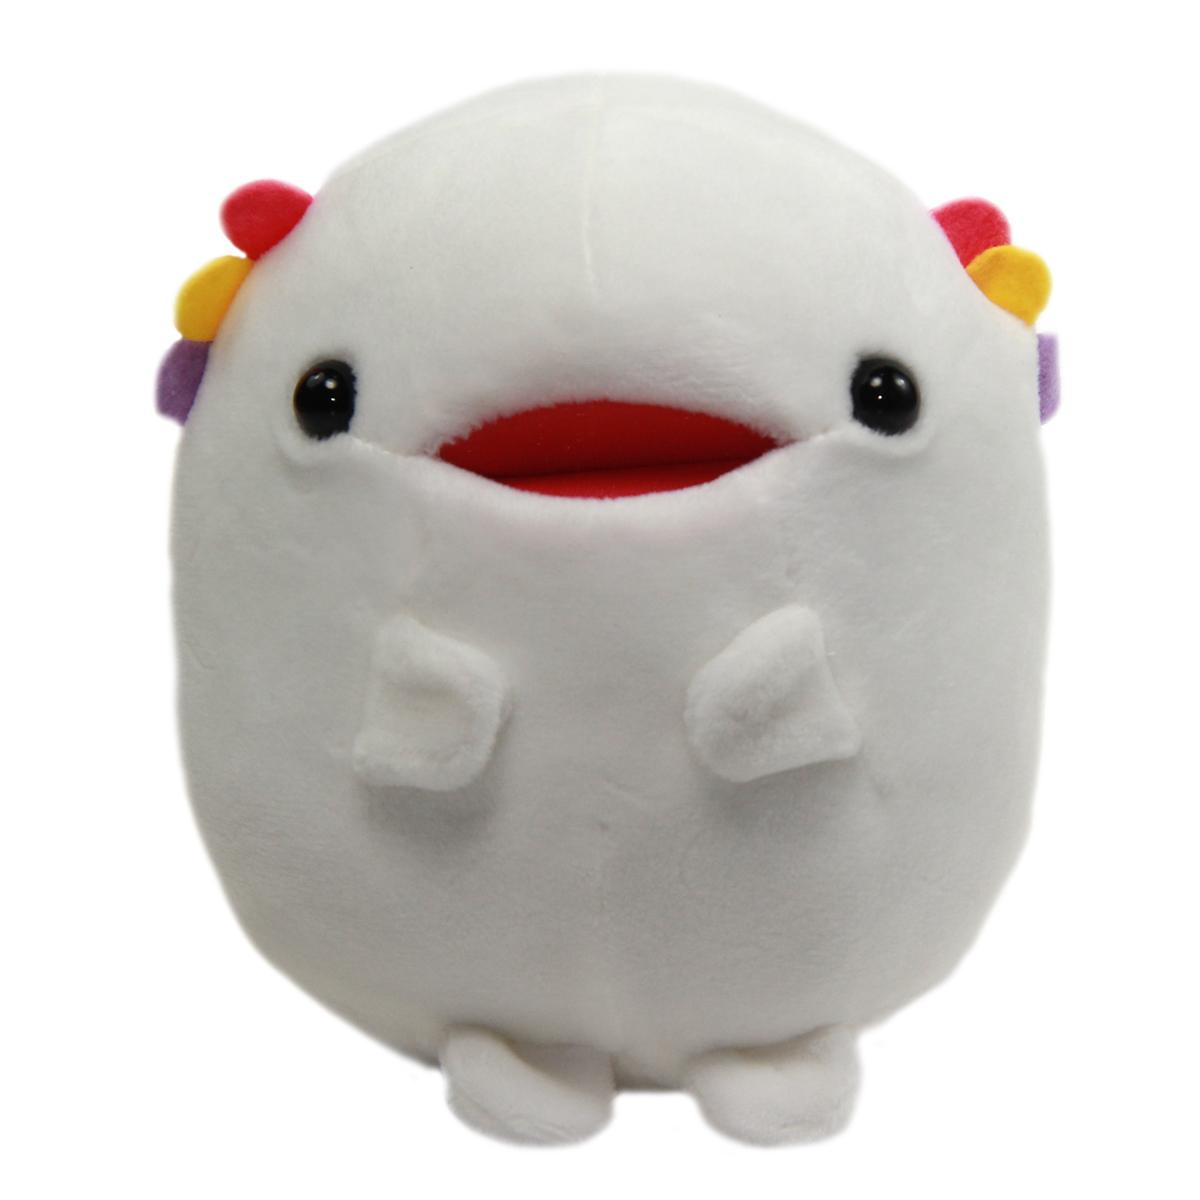 Albino Axolotl Plush Toy Tachippa!! Standing Super Soft Stuffed Animal White Uparupa 5